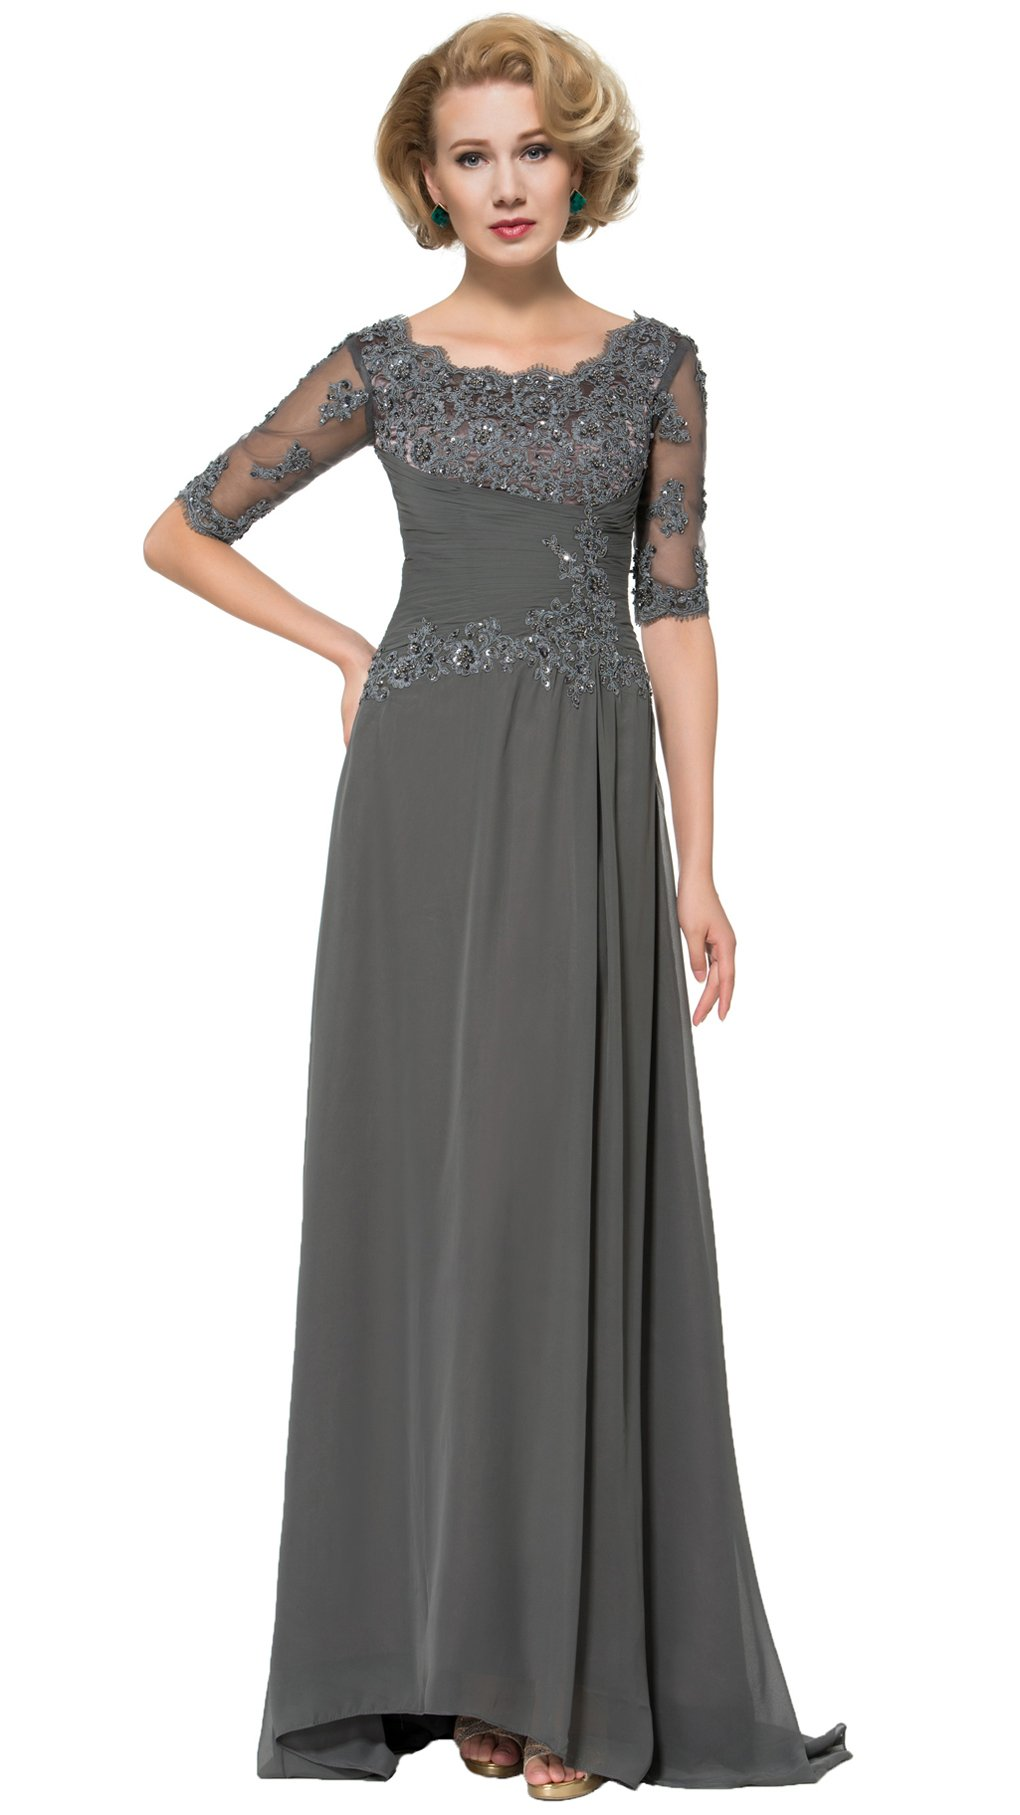 Snowskite Women's Elegant Empire Waist Half Sleeves Mother of the Bride Dress Grey 14